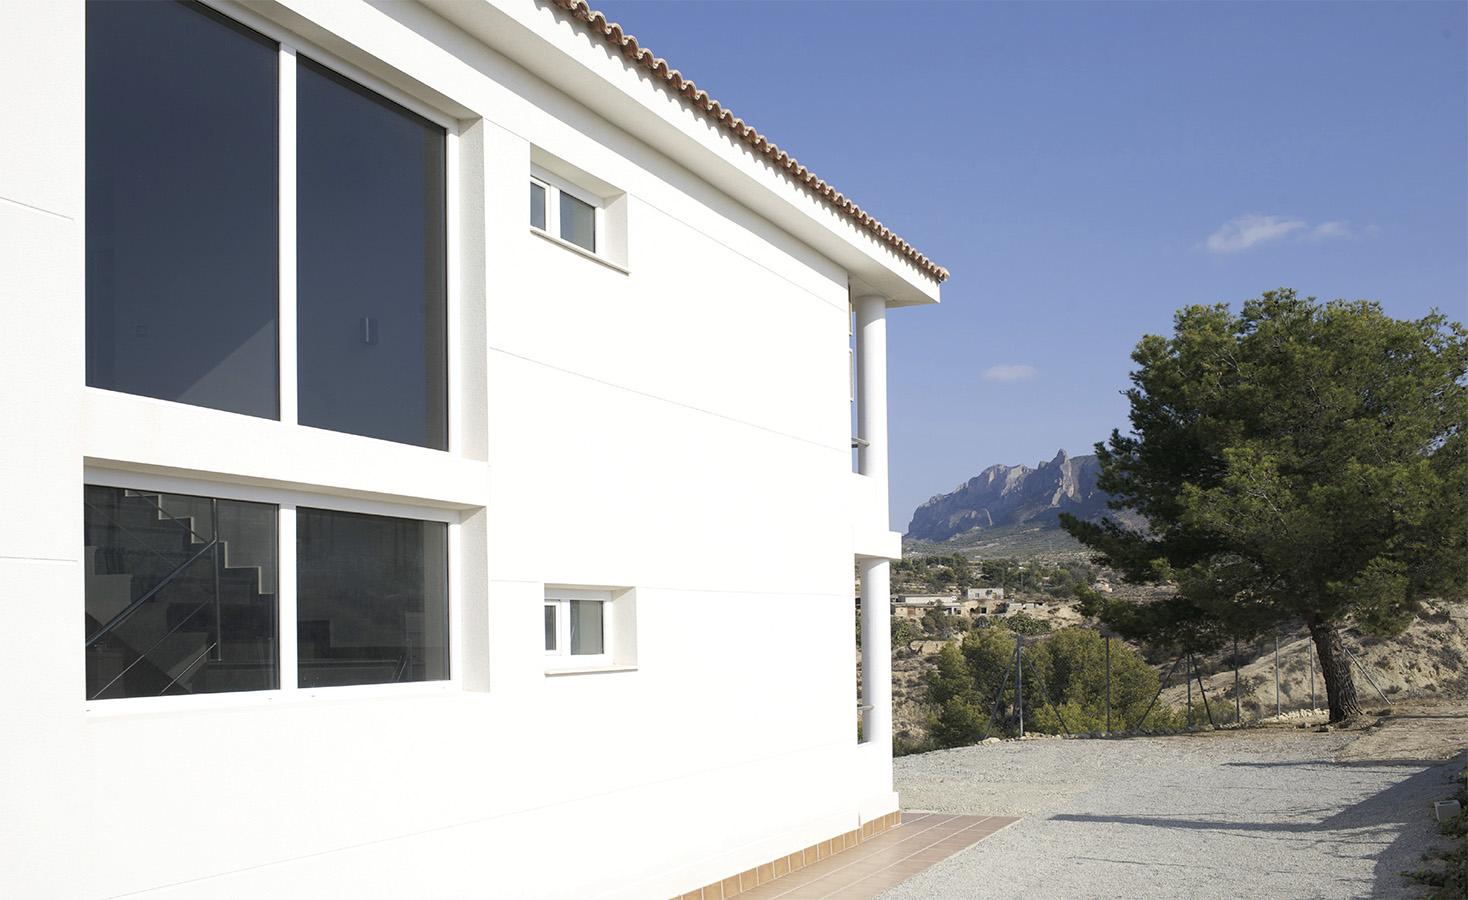 Villa Bussot white facade, new building, Alicante, Bussot